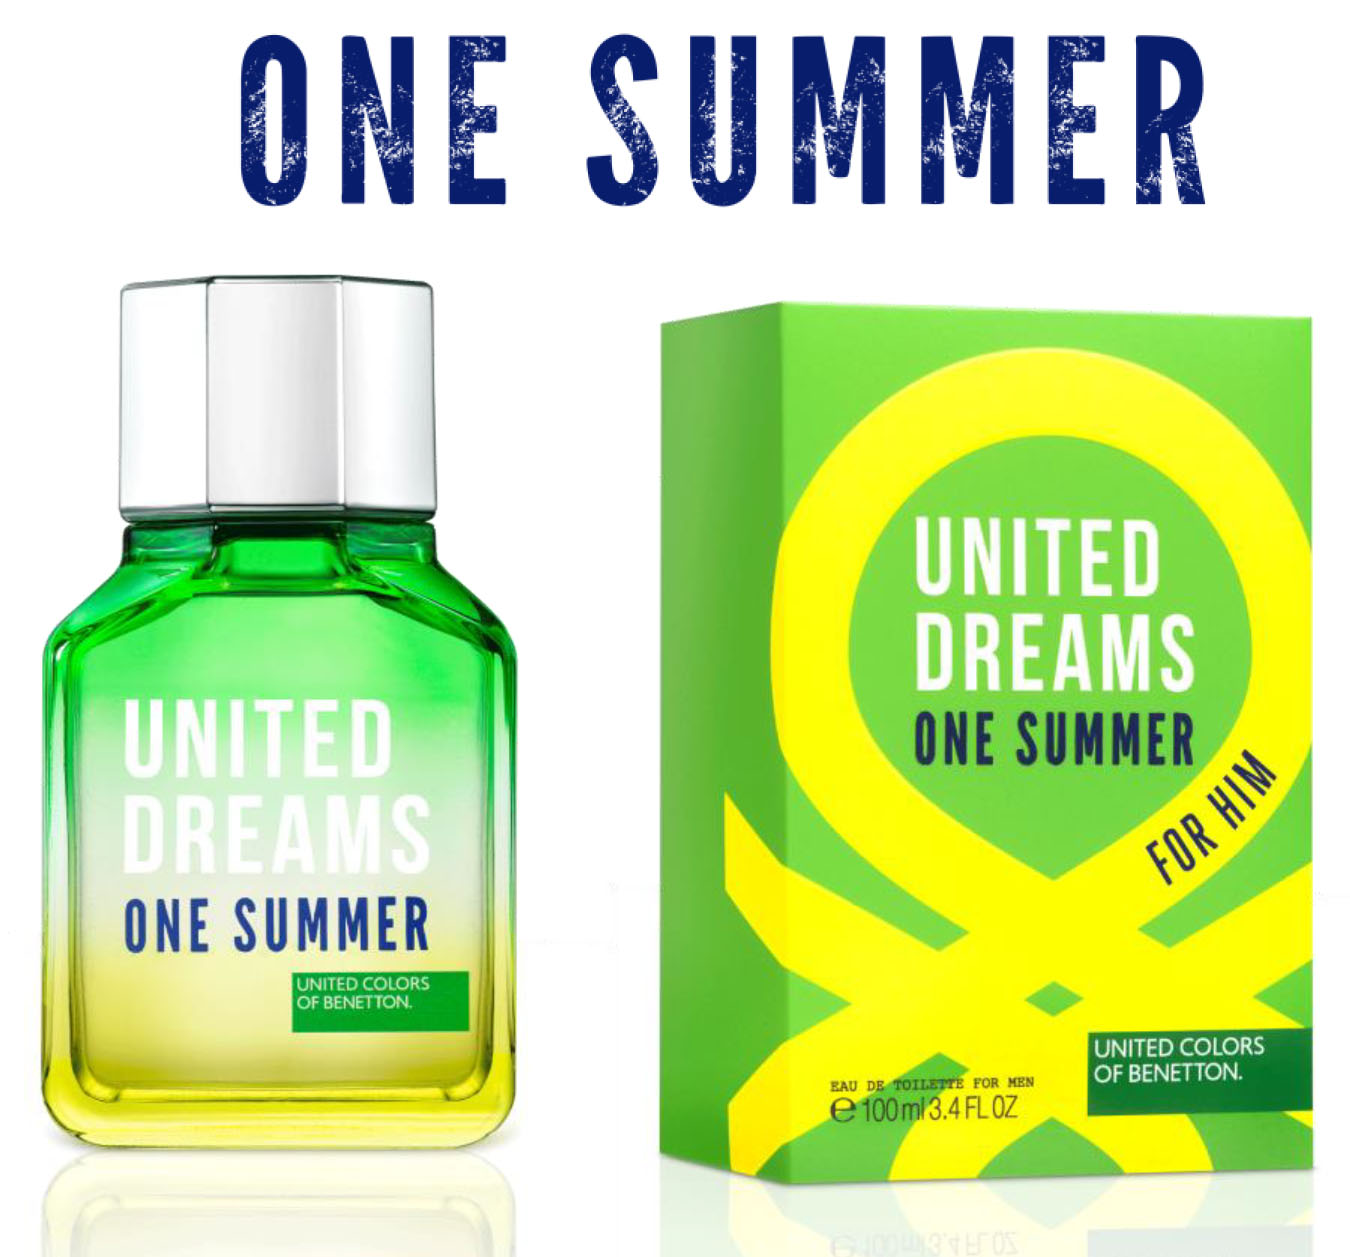 869b7512e benetton one summer flacon and box. BENETTON UNITED DREAMS ...